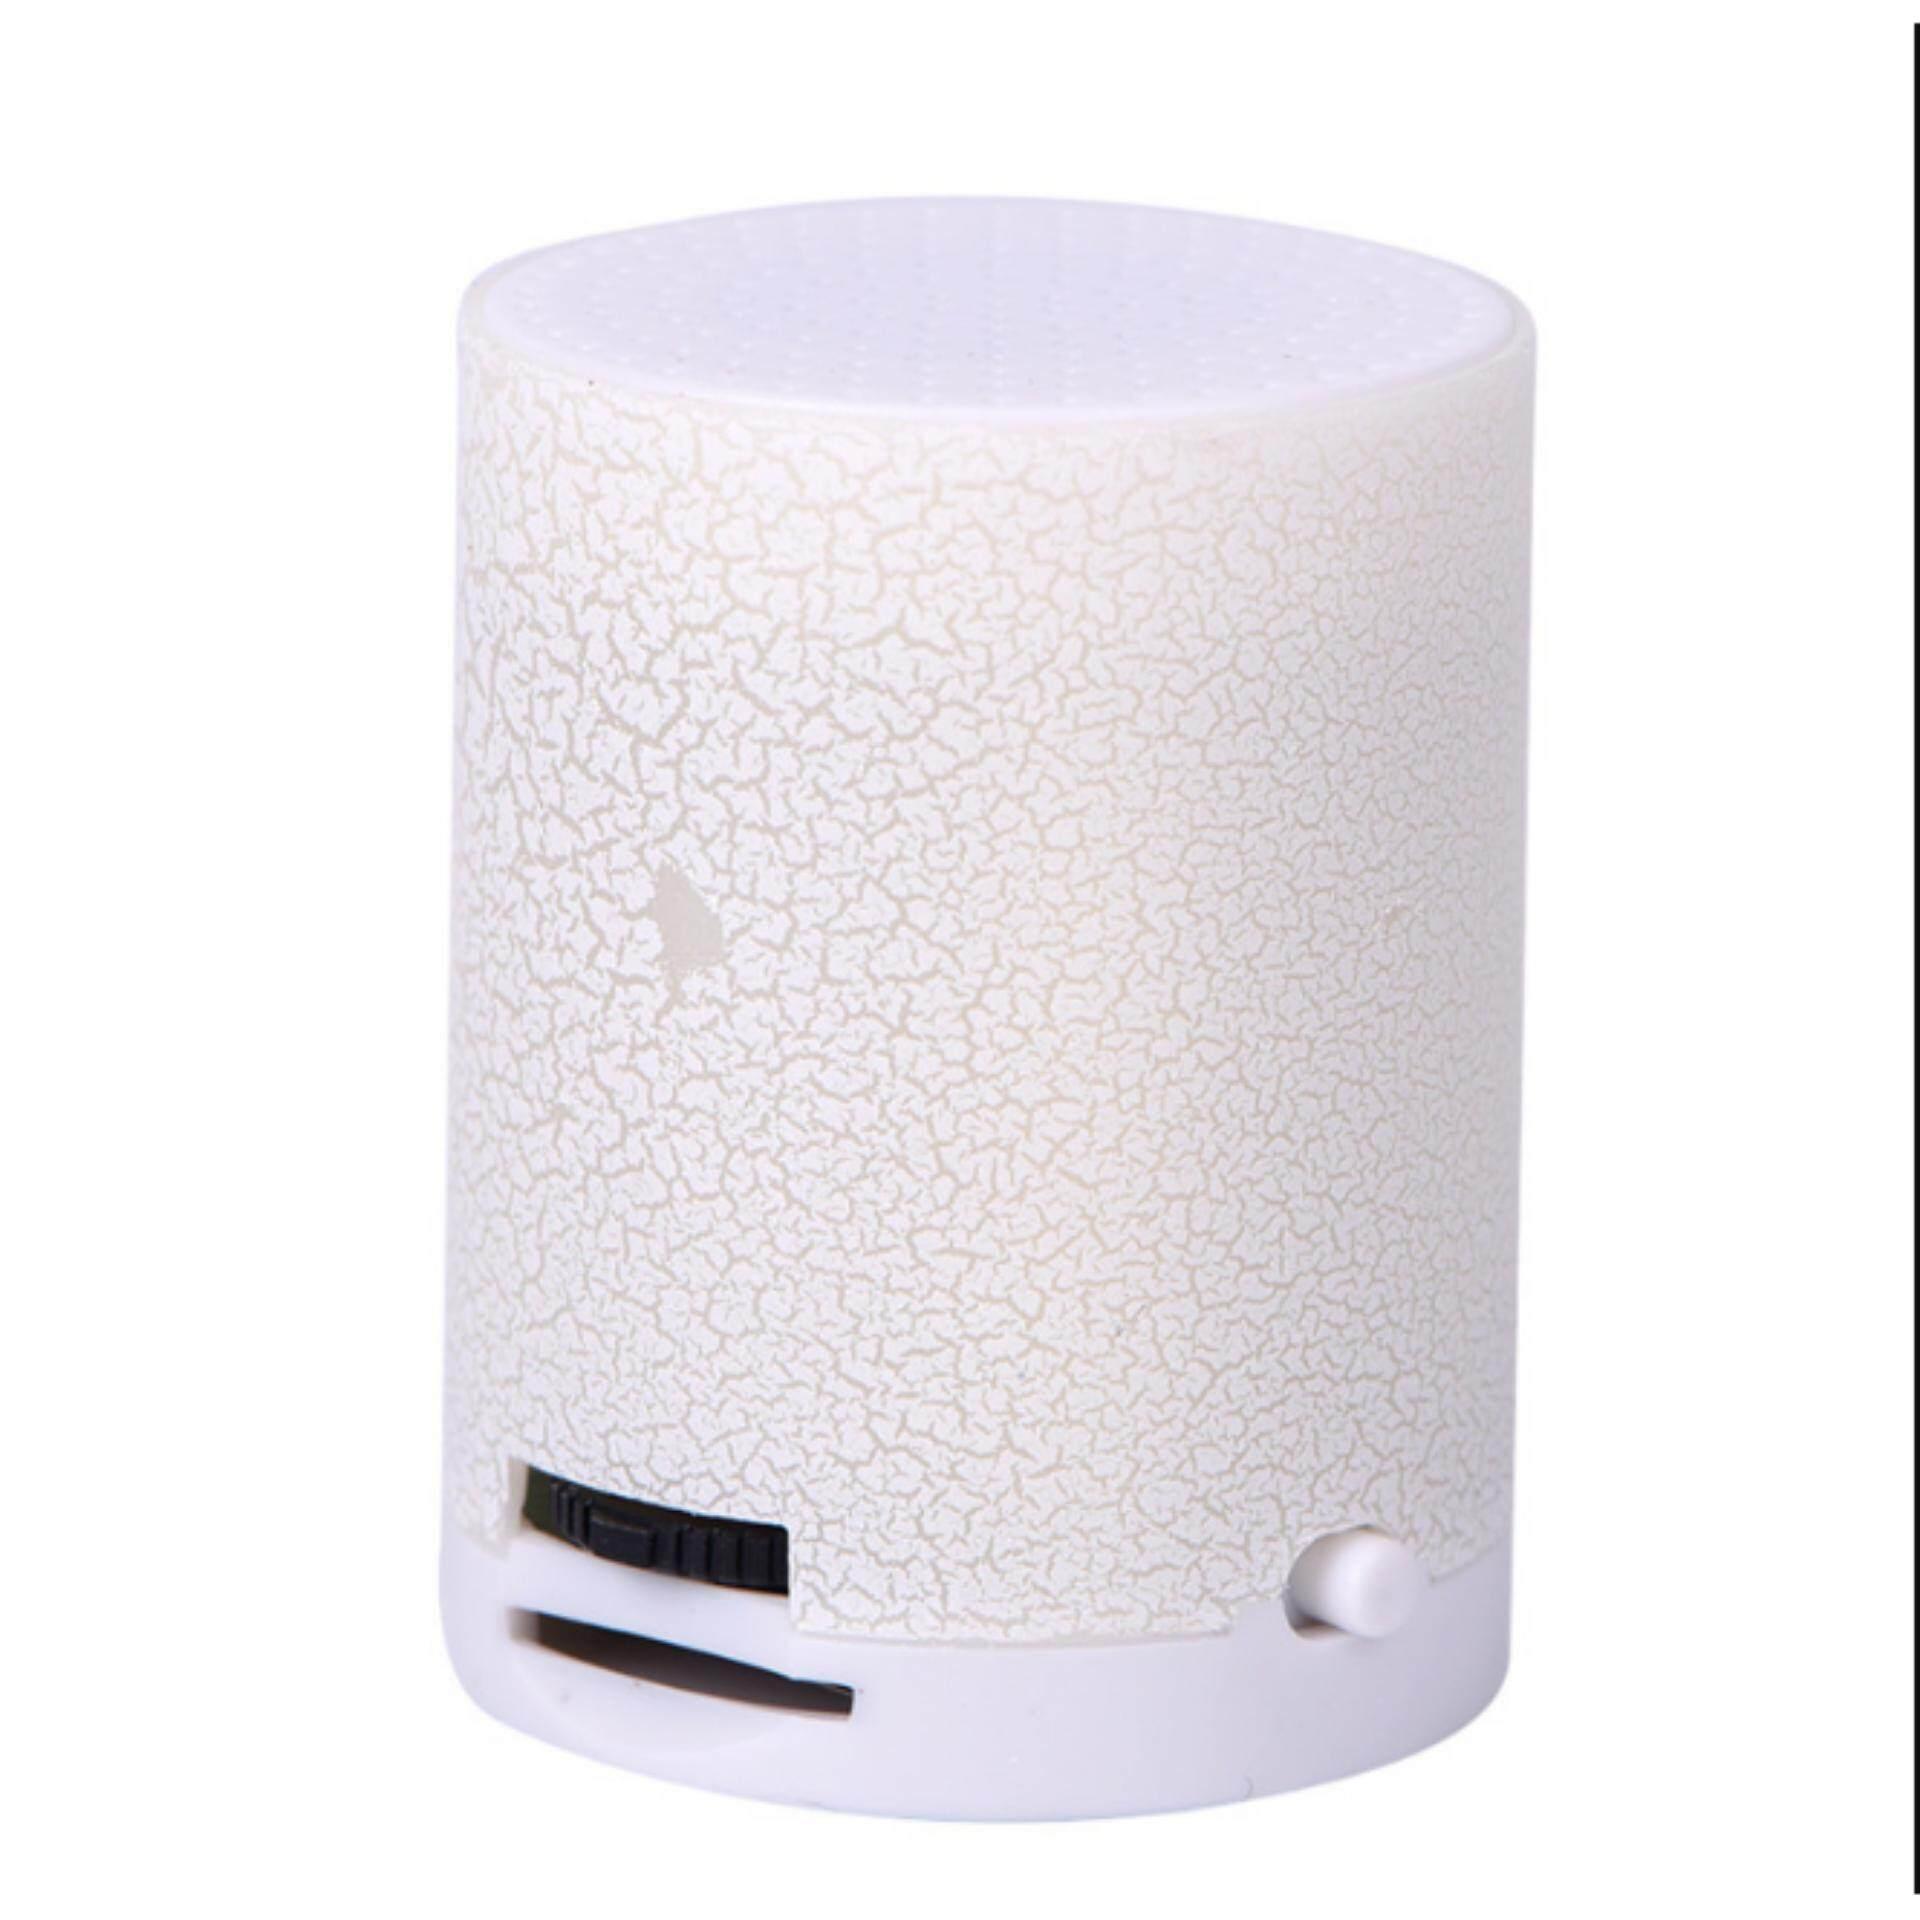 Harga Spesifikasi High Quality Music Bluetooth Speaker